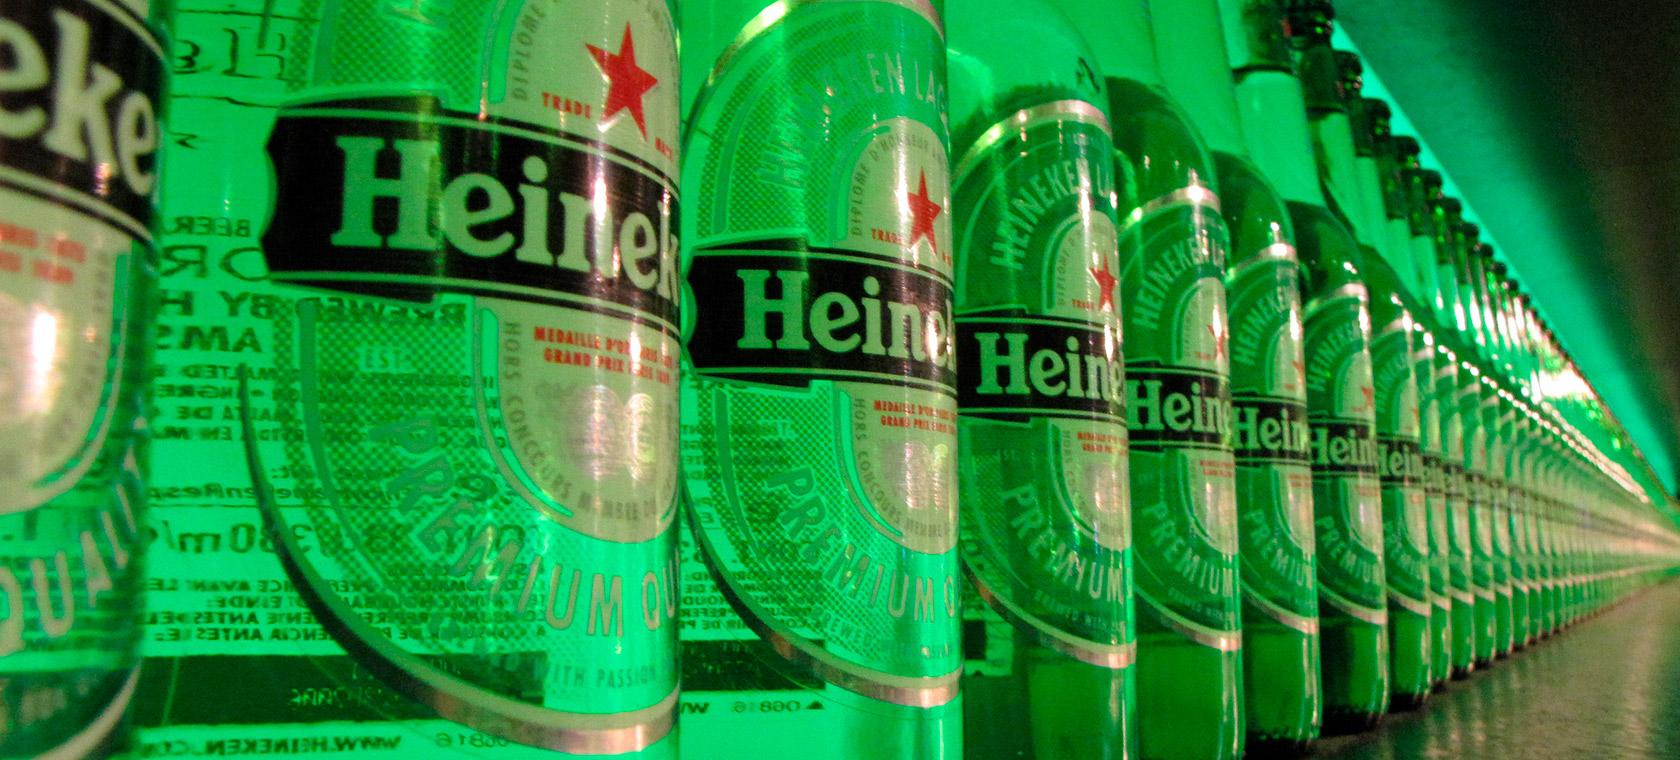 beer and heineken essay Marketing research - heineken essay  heineken international boasts one of the world's largest and most profitable portfolios of beer brands - marketing research - heineken essay.